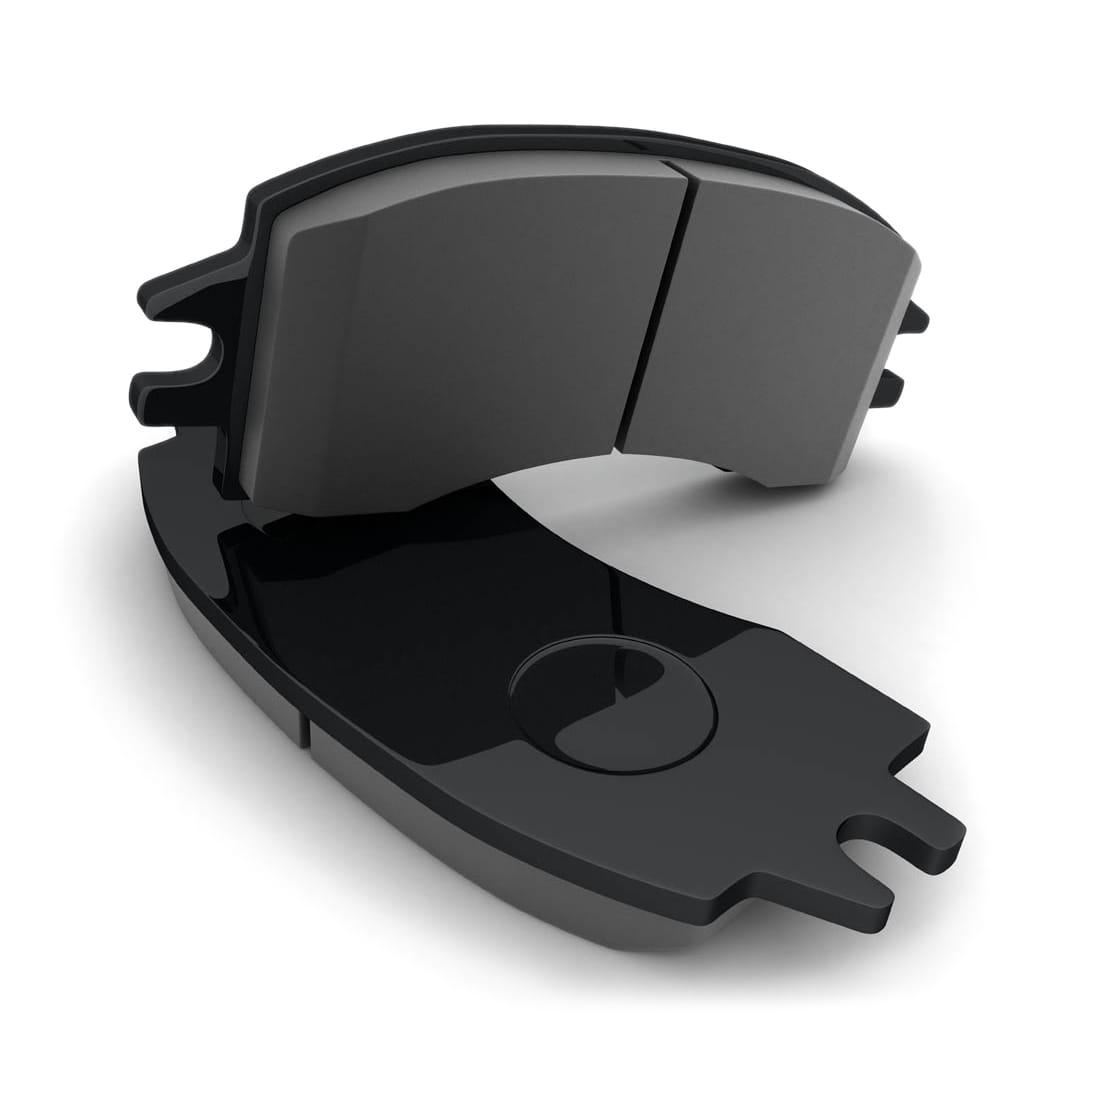 Brake Pads from Kwik-Fit